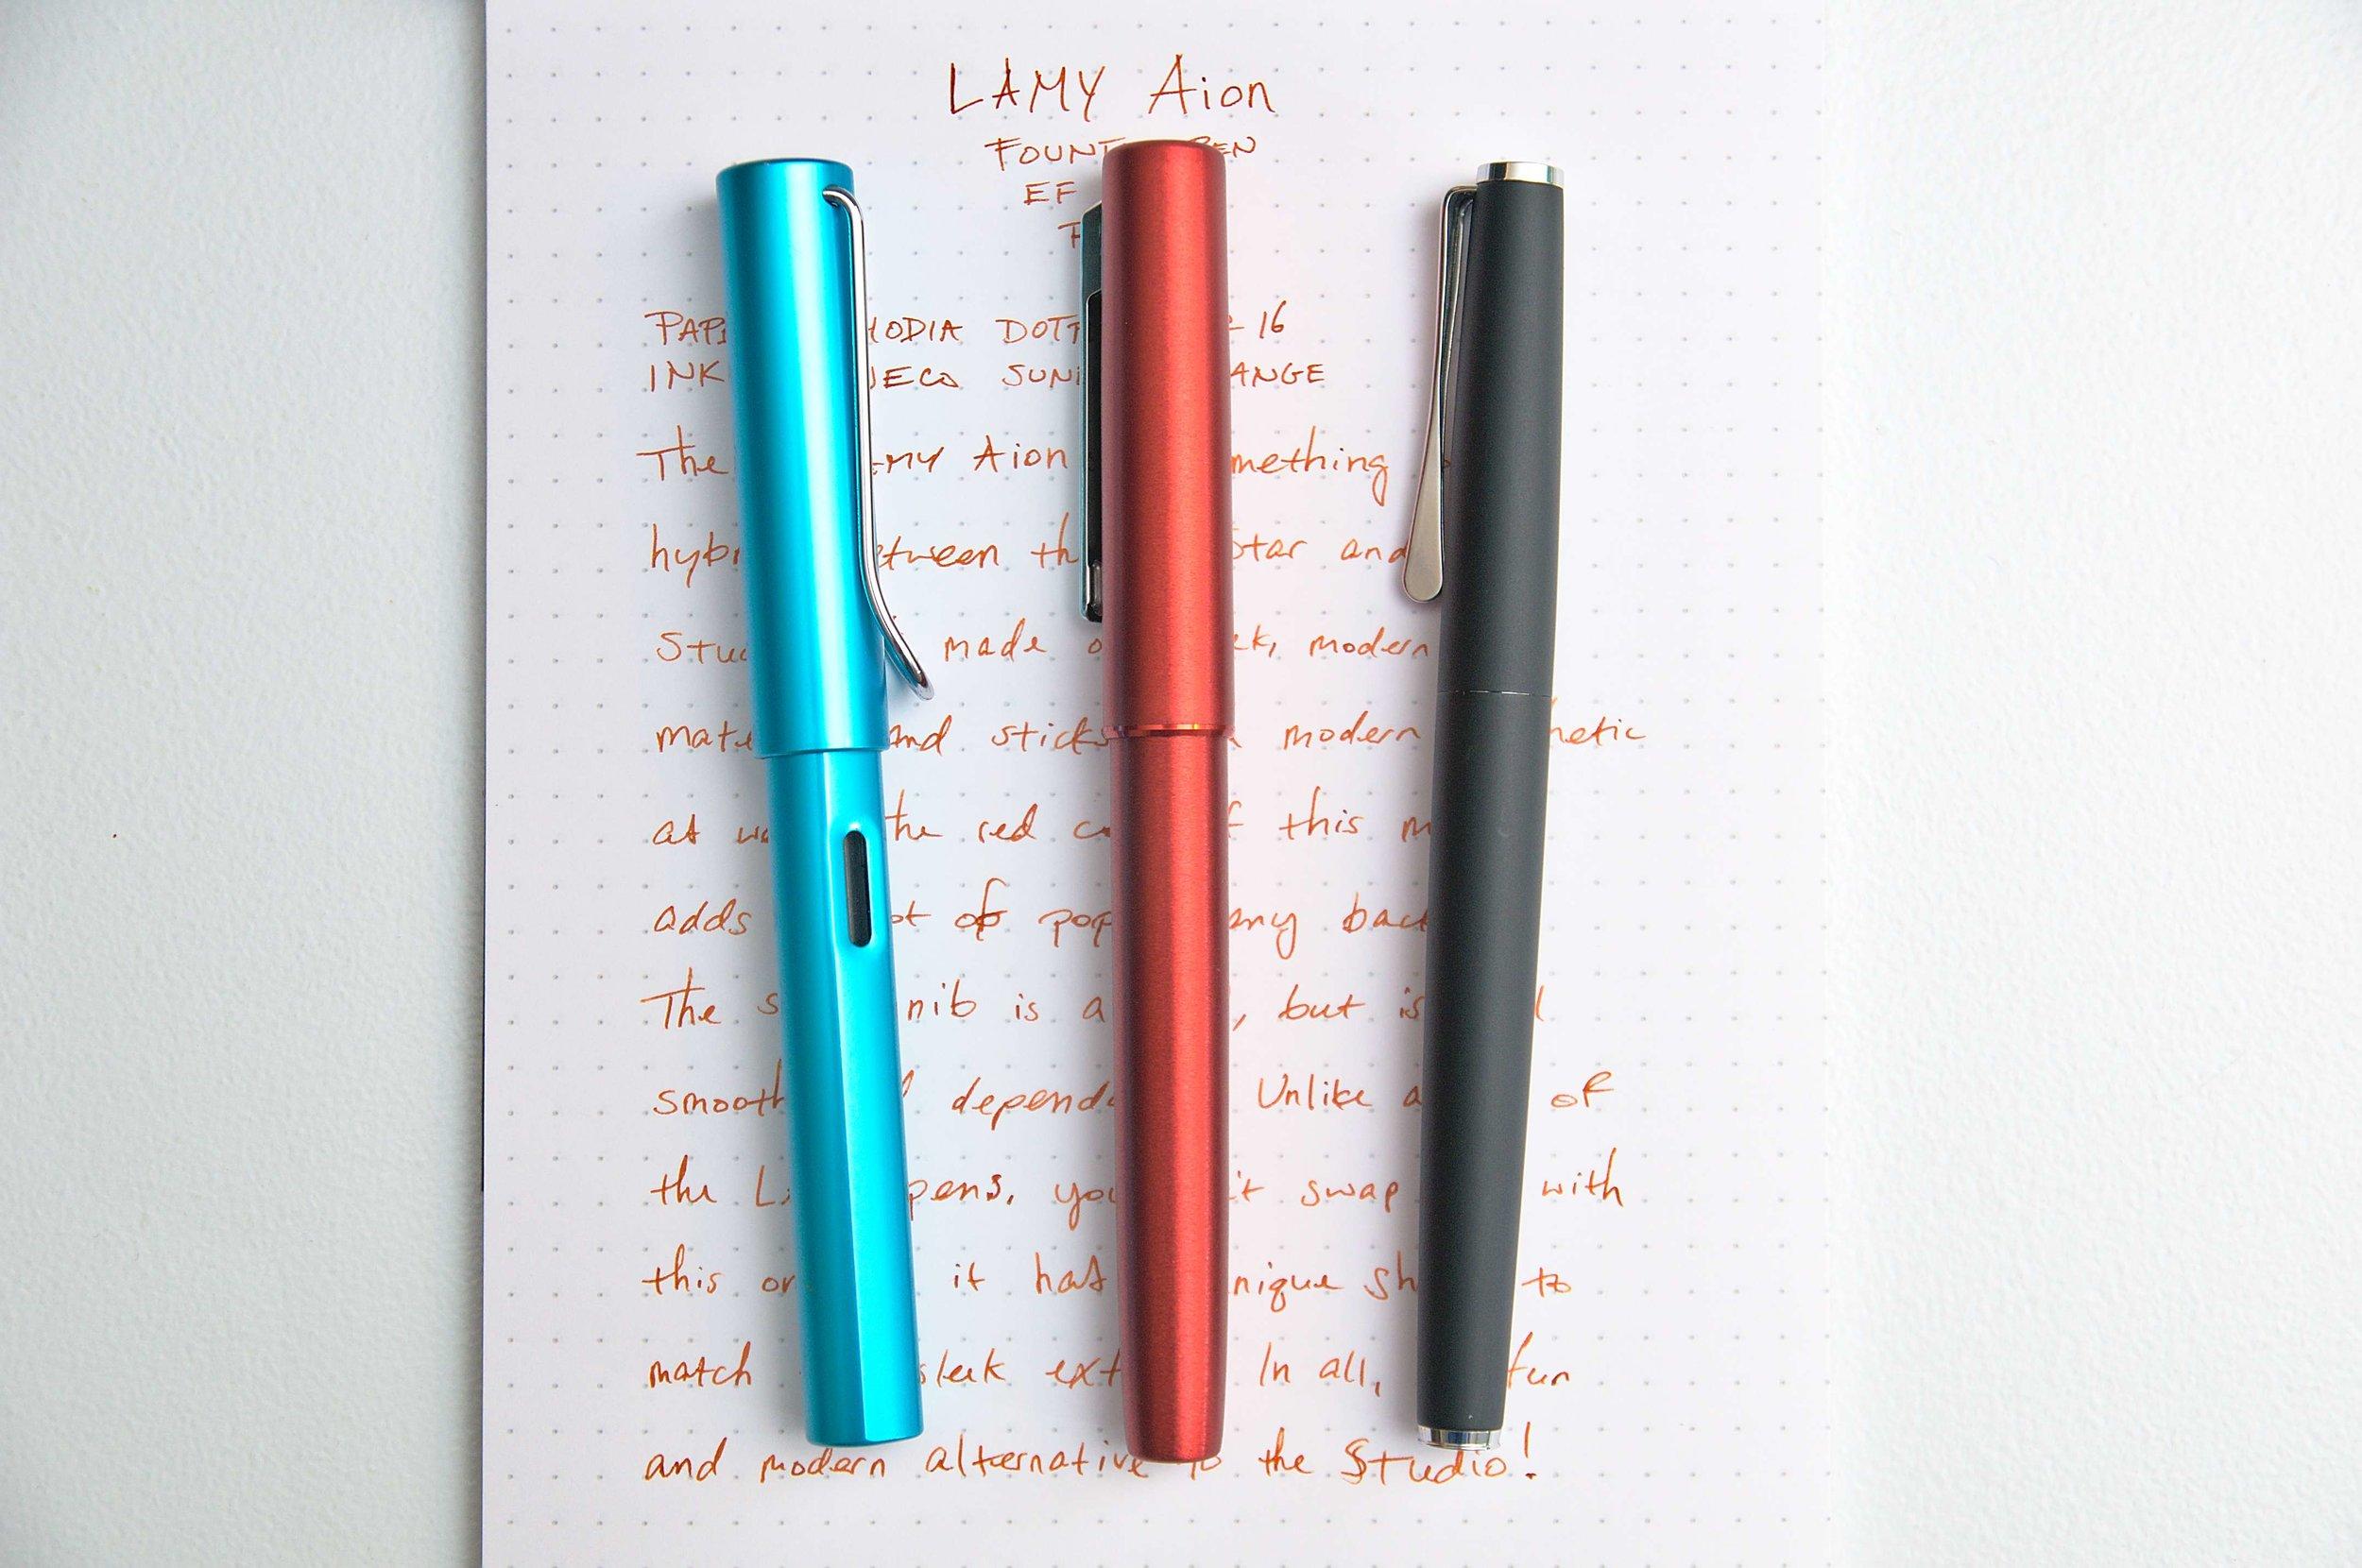 Lamy Aion Fountain Pen Comparison